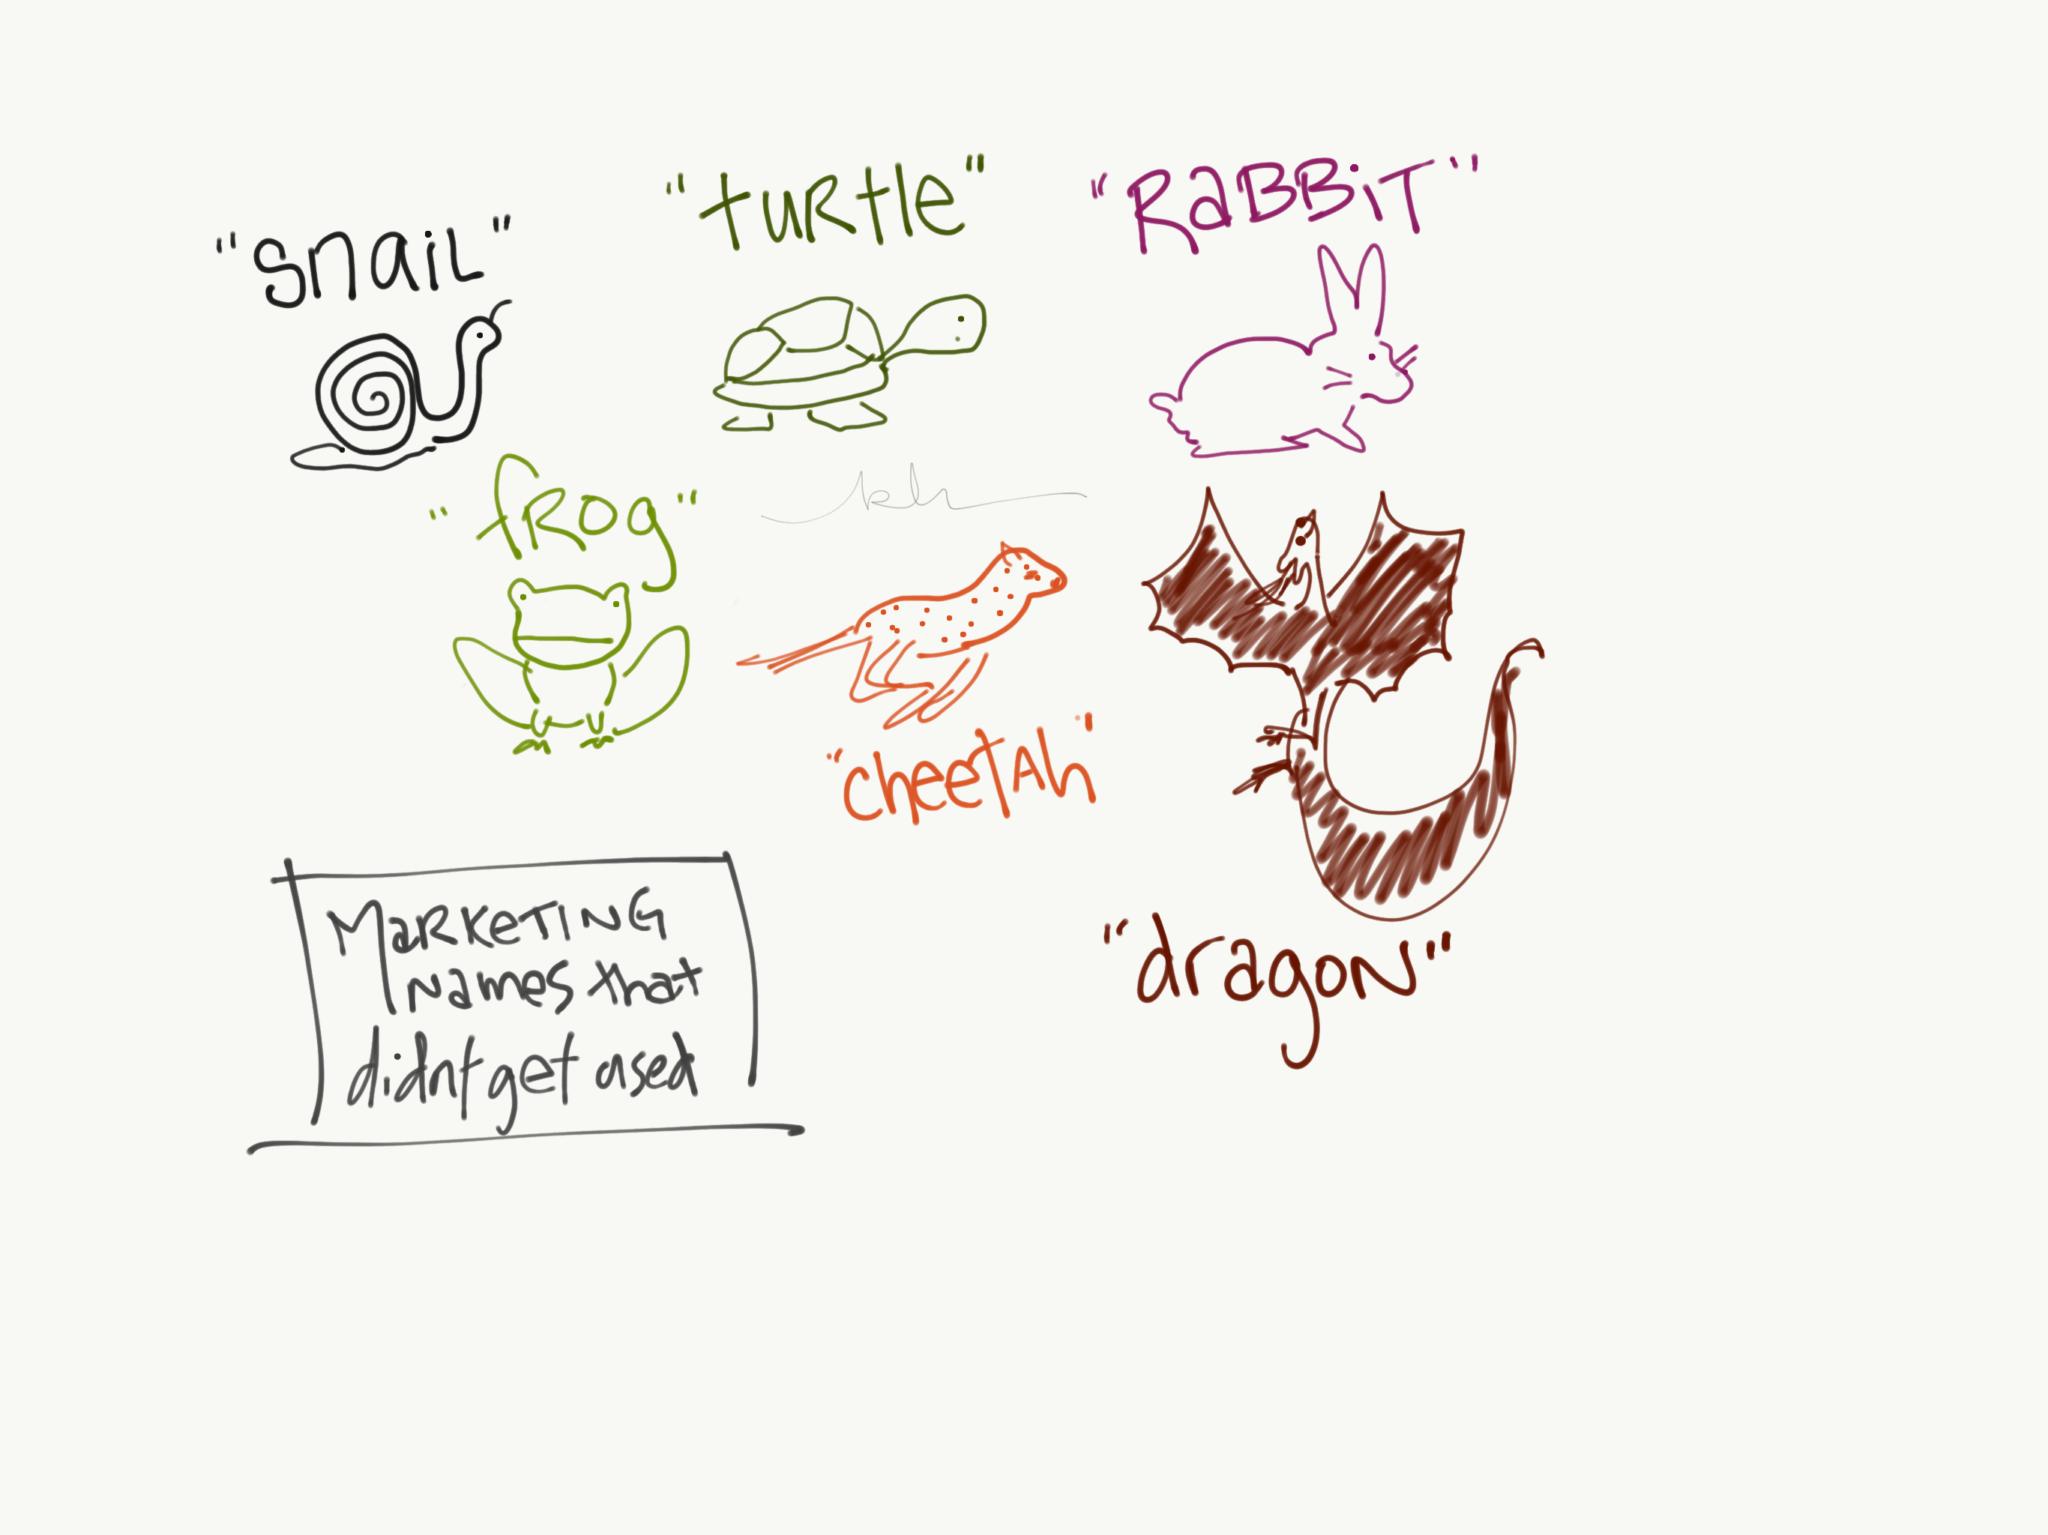 Brainstorm all your ideas